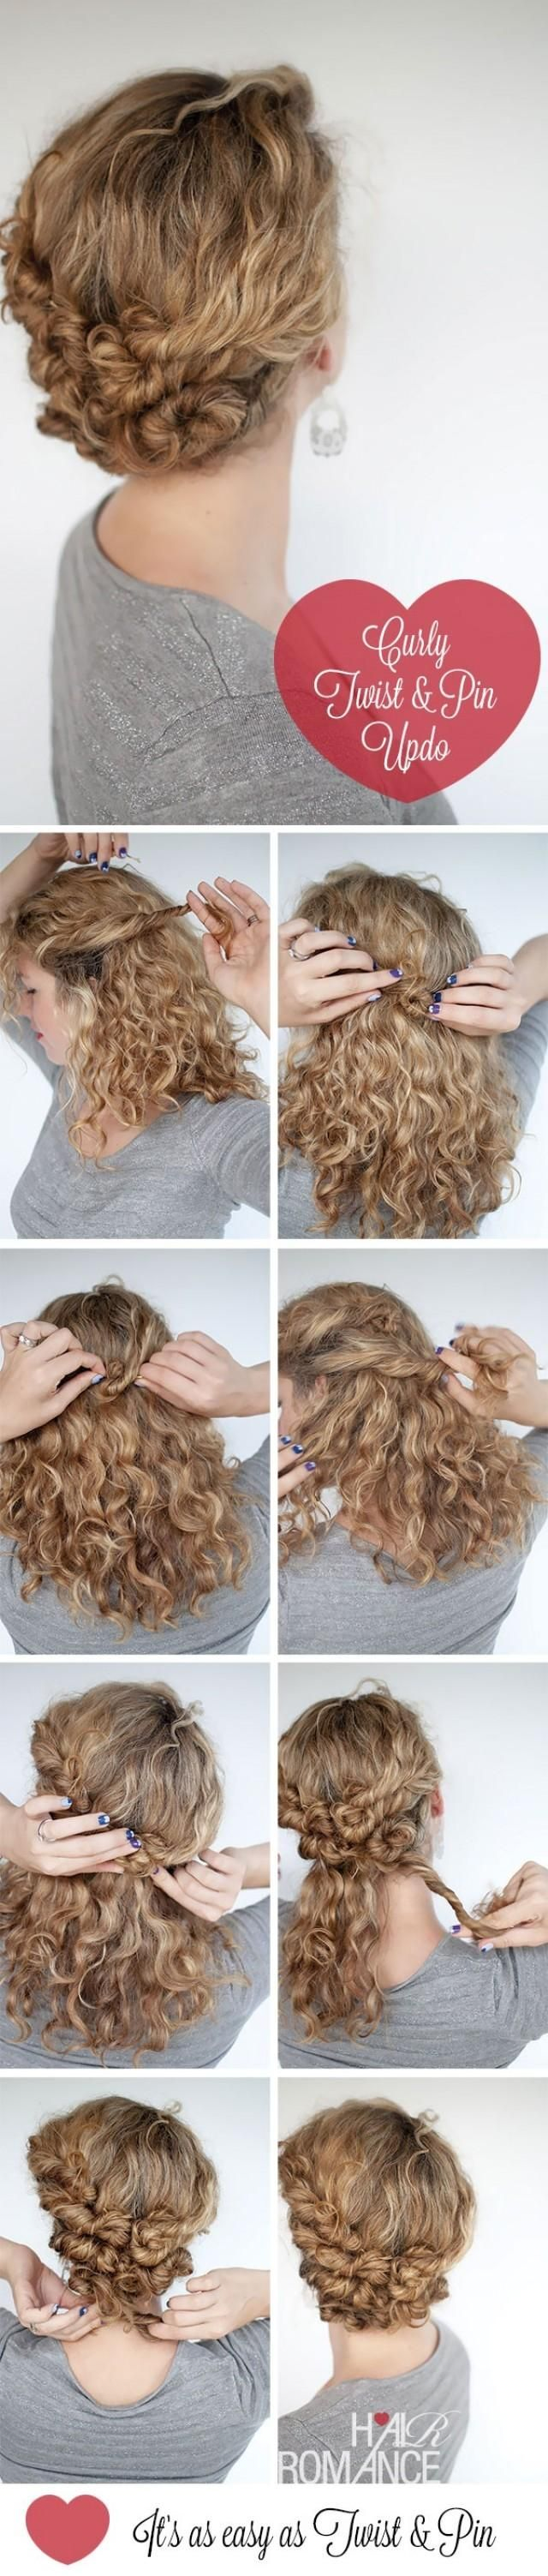 curly Twist